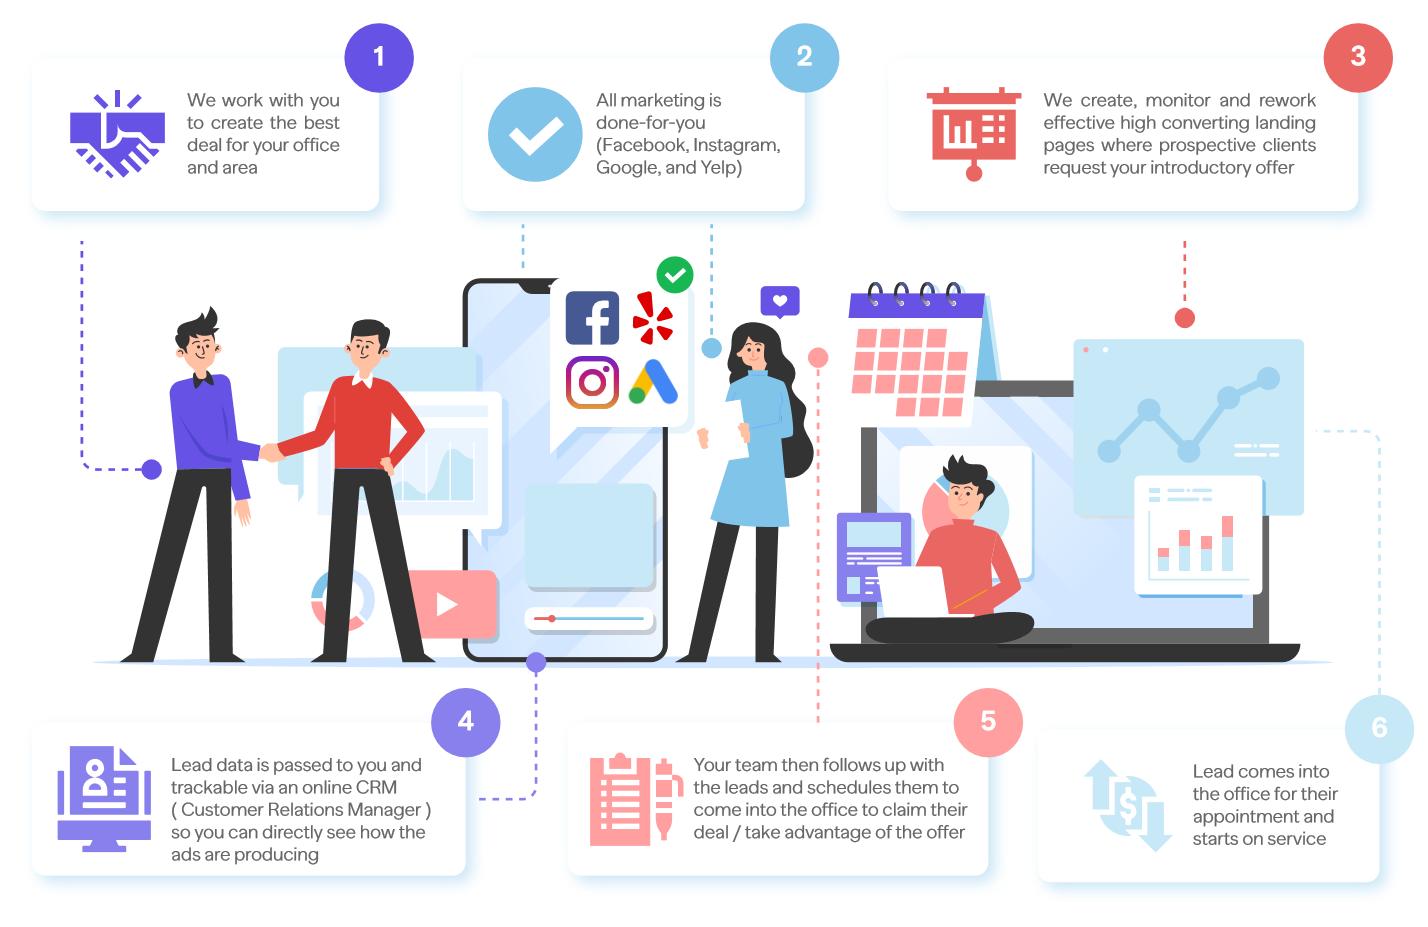 Digital Marketing Flow Image